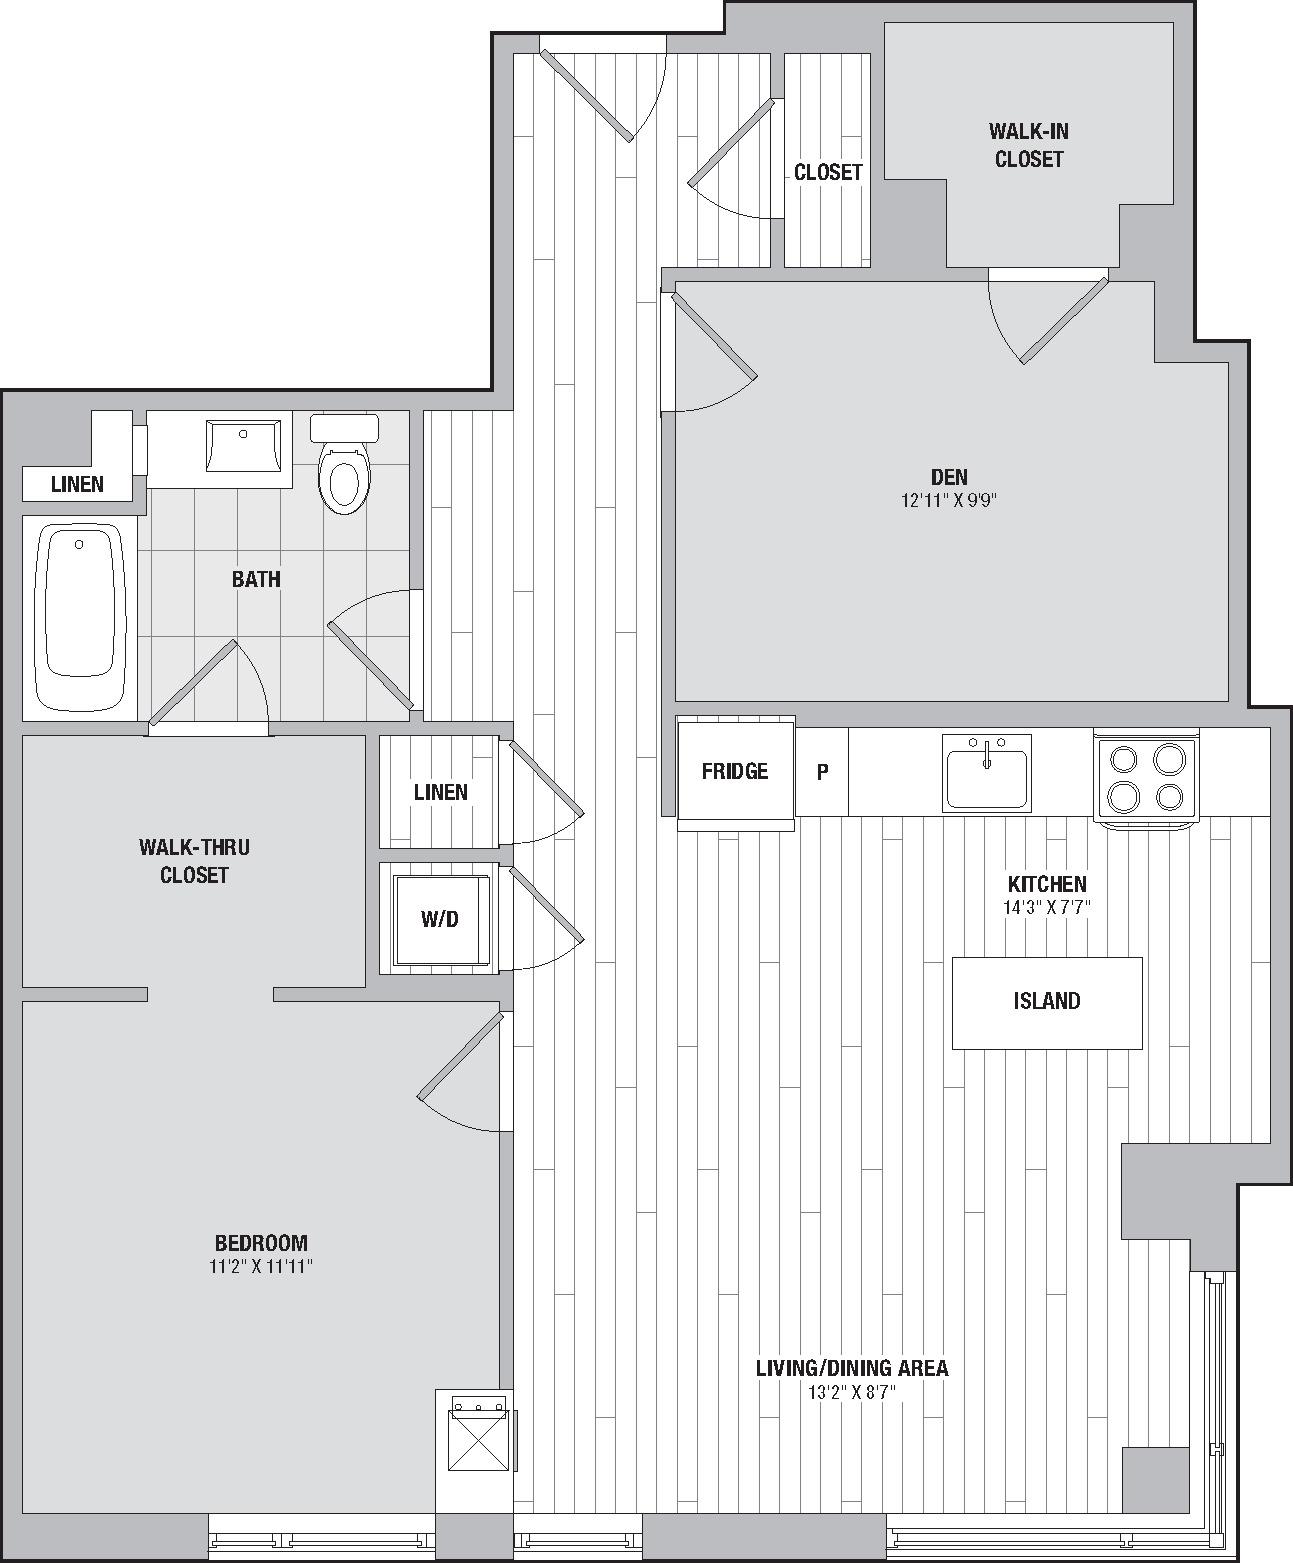 Apartment 0308 floorplan